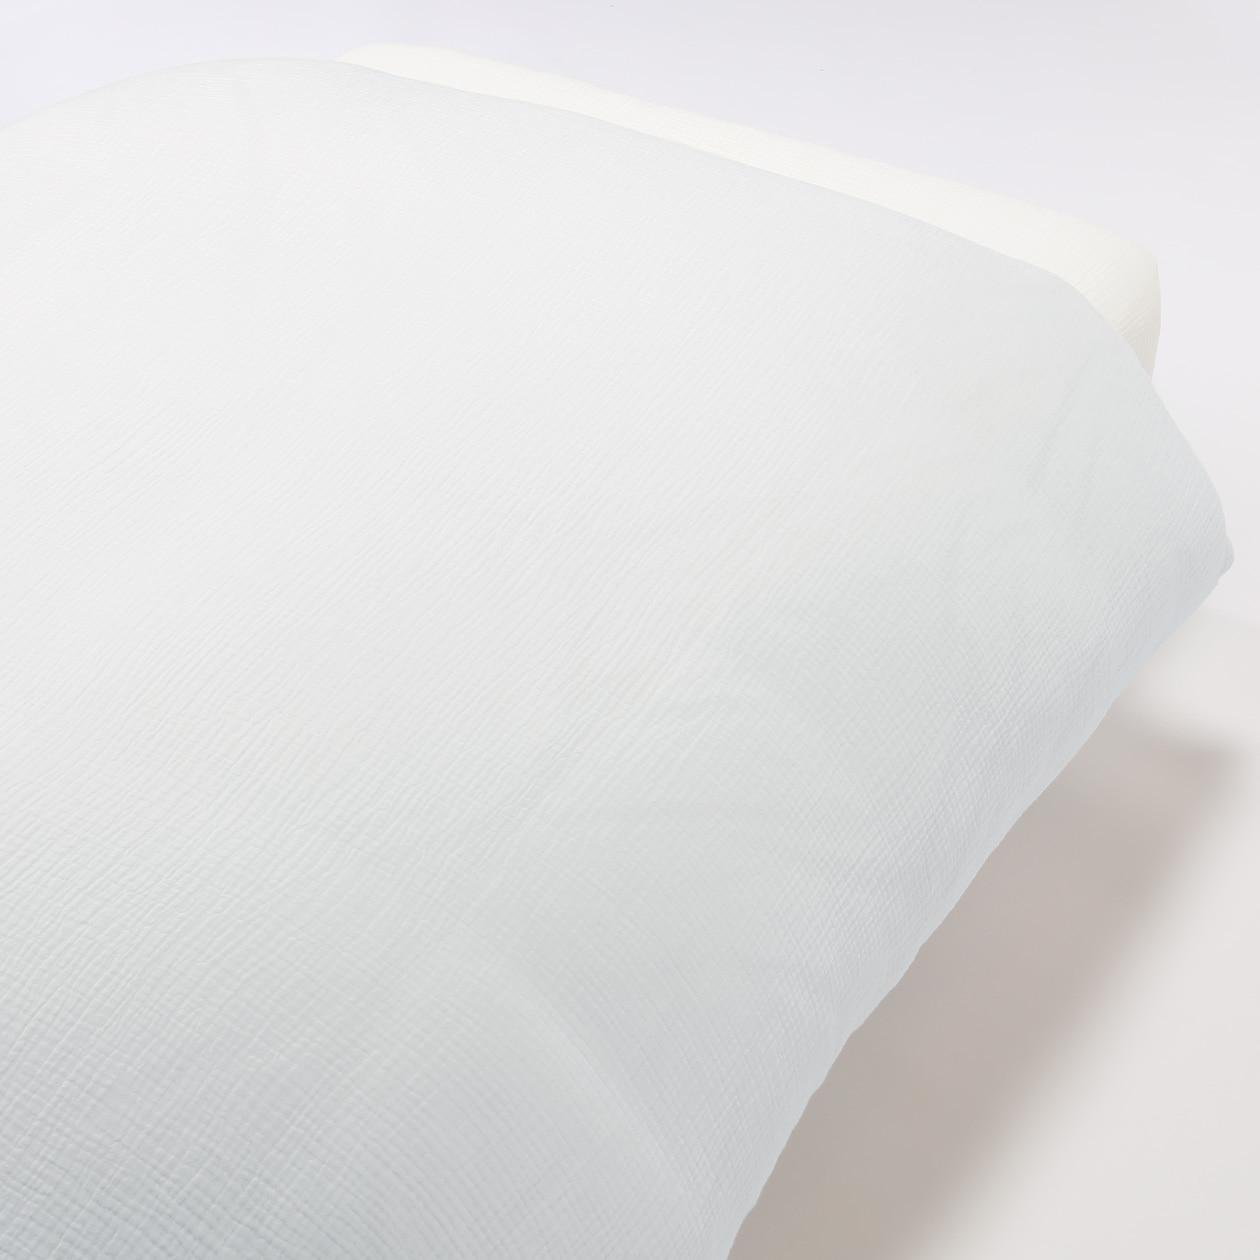 RoomClip商品情報 - オーガニックコットン三重ガーゼ掛ふとんカバー・SD/オフ白 SD/オフ白